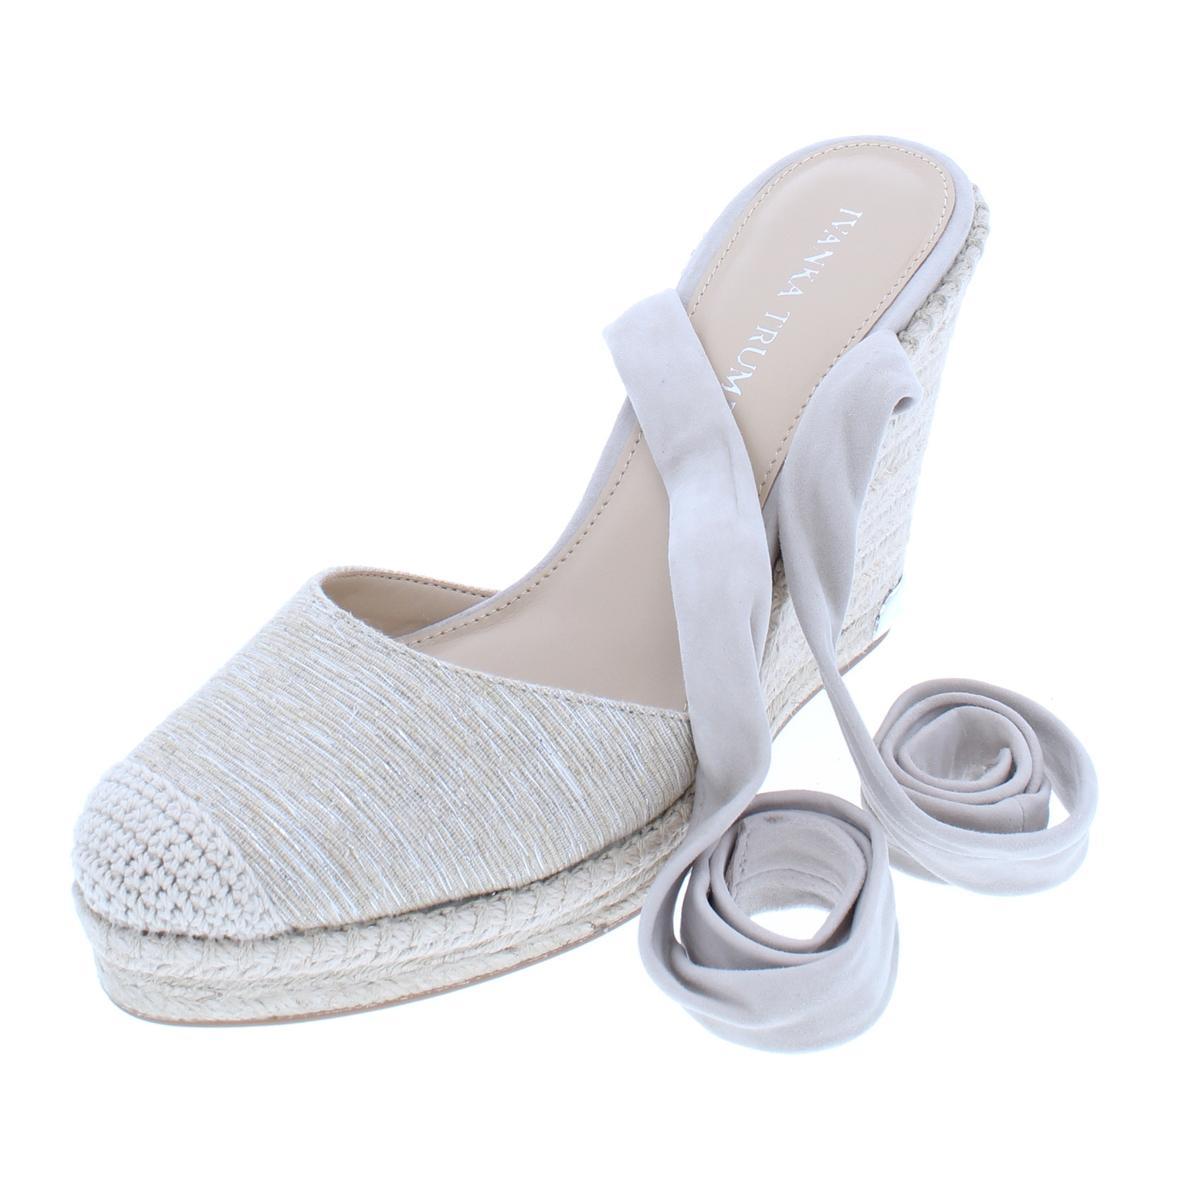 ed9fa8fb4659 Details about Ivanka Trump Womens Winikka 2 Beige Wedge Heels Shoes 10  Medium (B